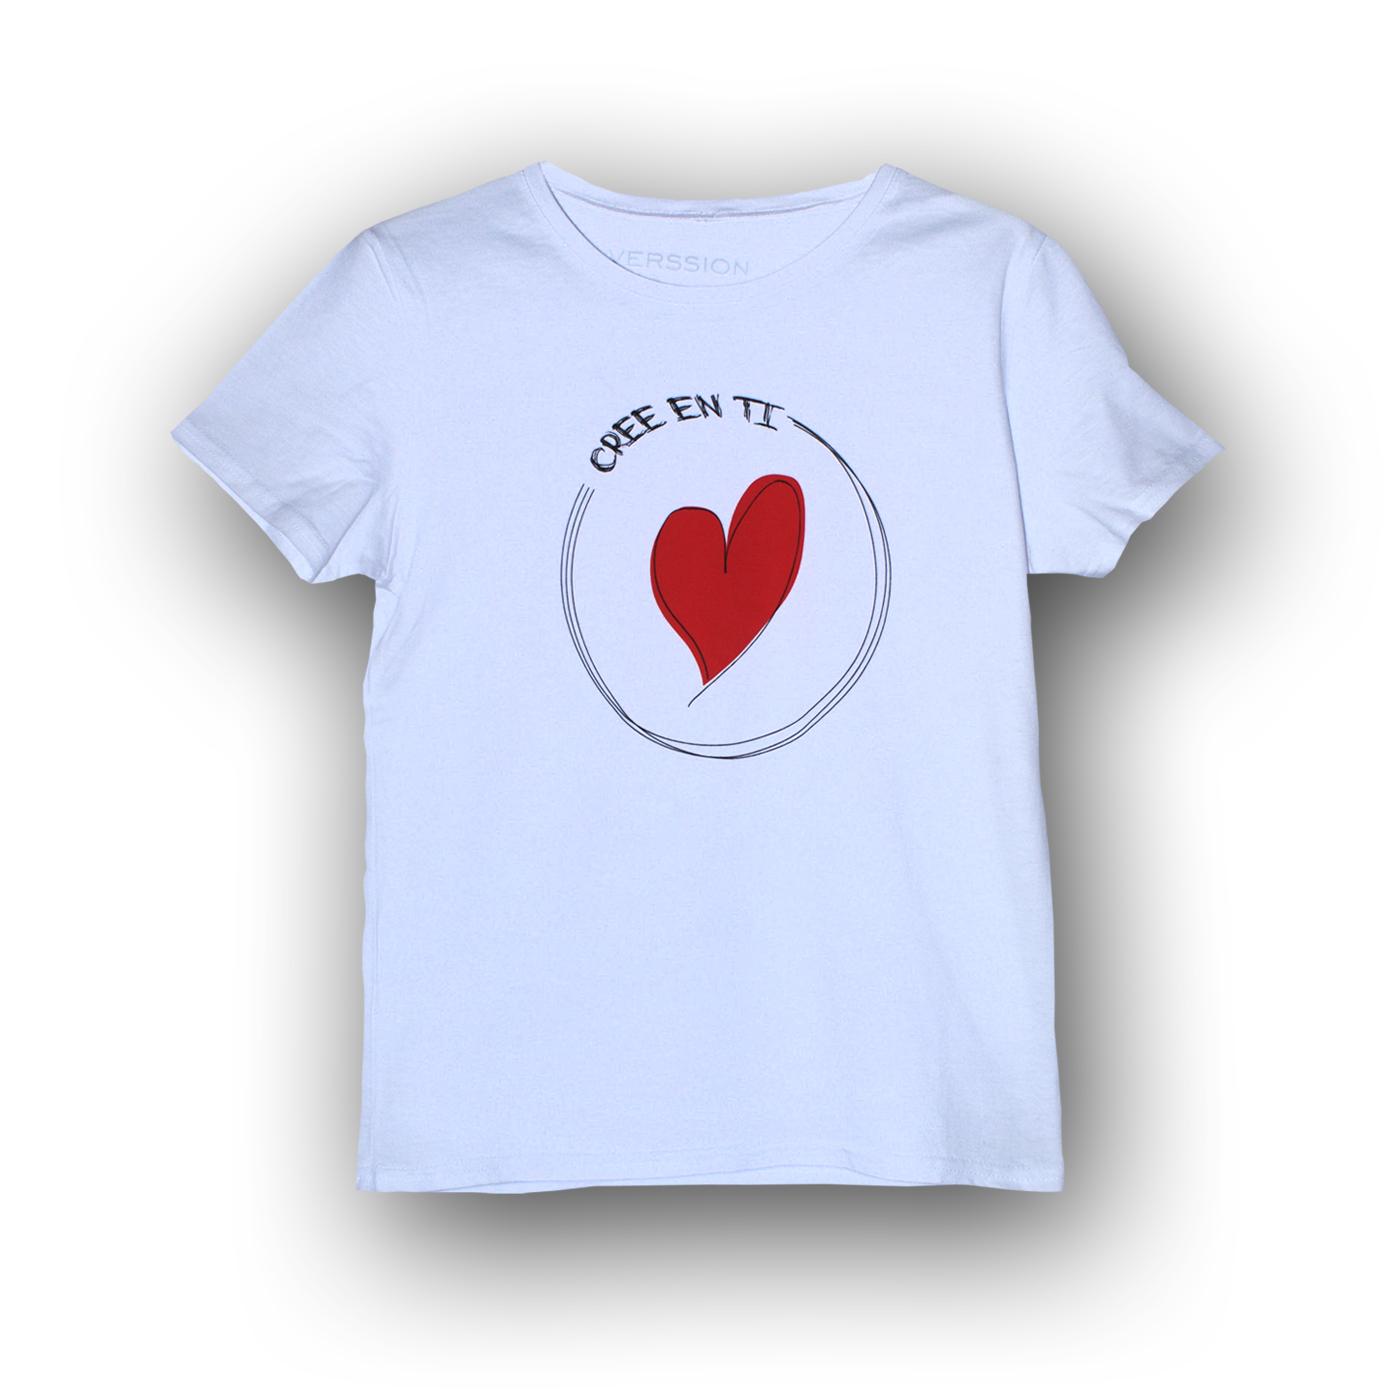 CamisetaConMensaje_CreeEnTi